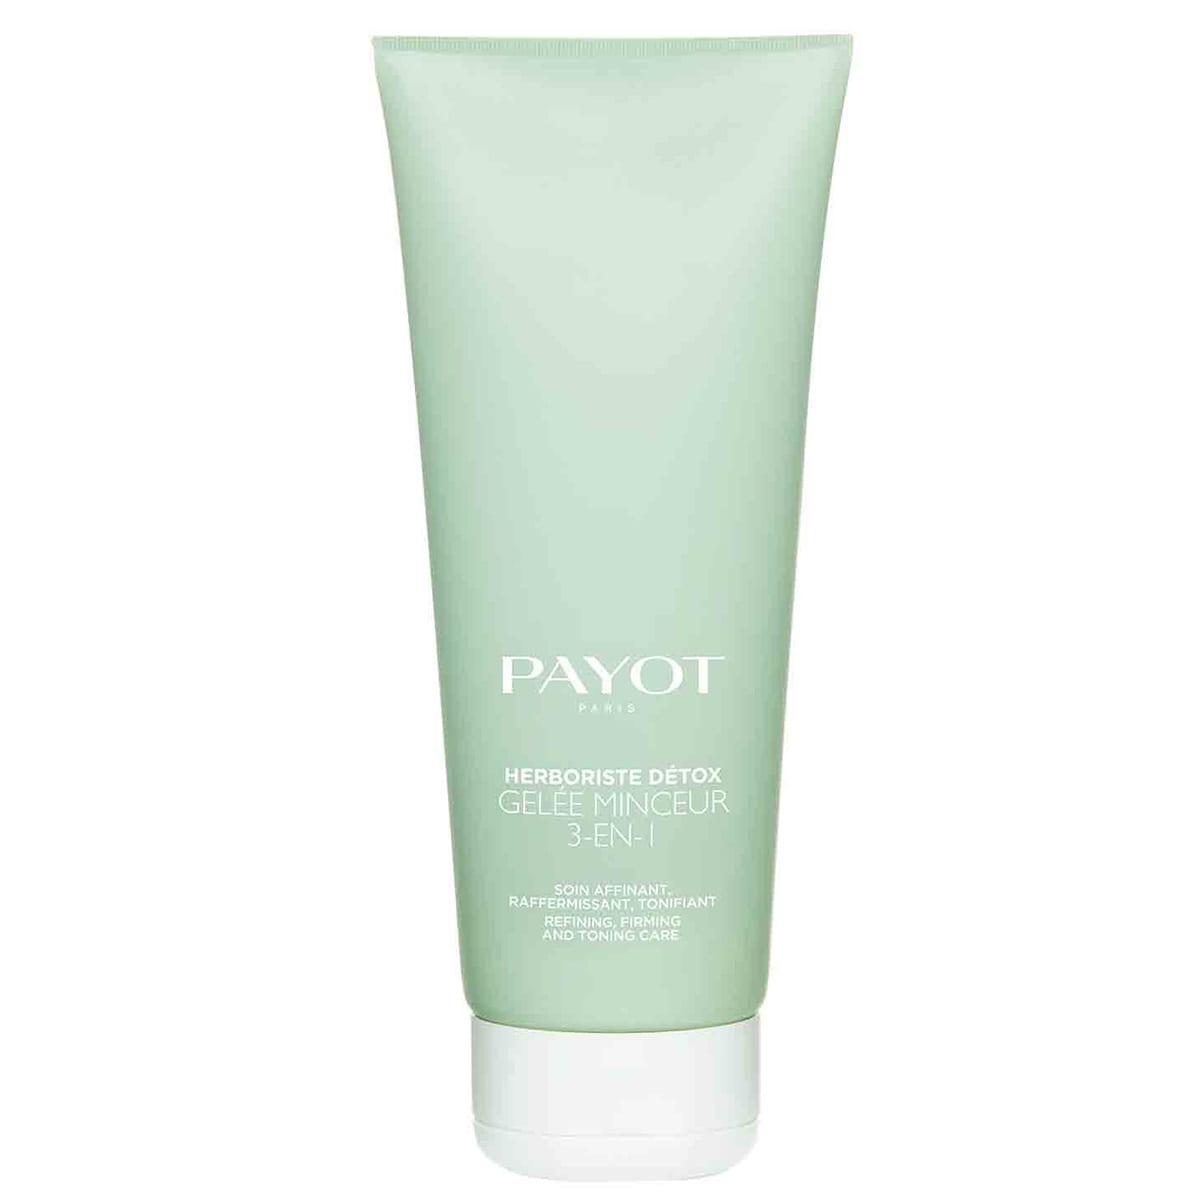 Payot - Herboriste Detox Gelée Minceur 3-En-1